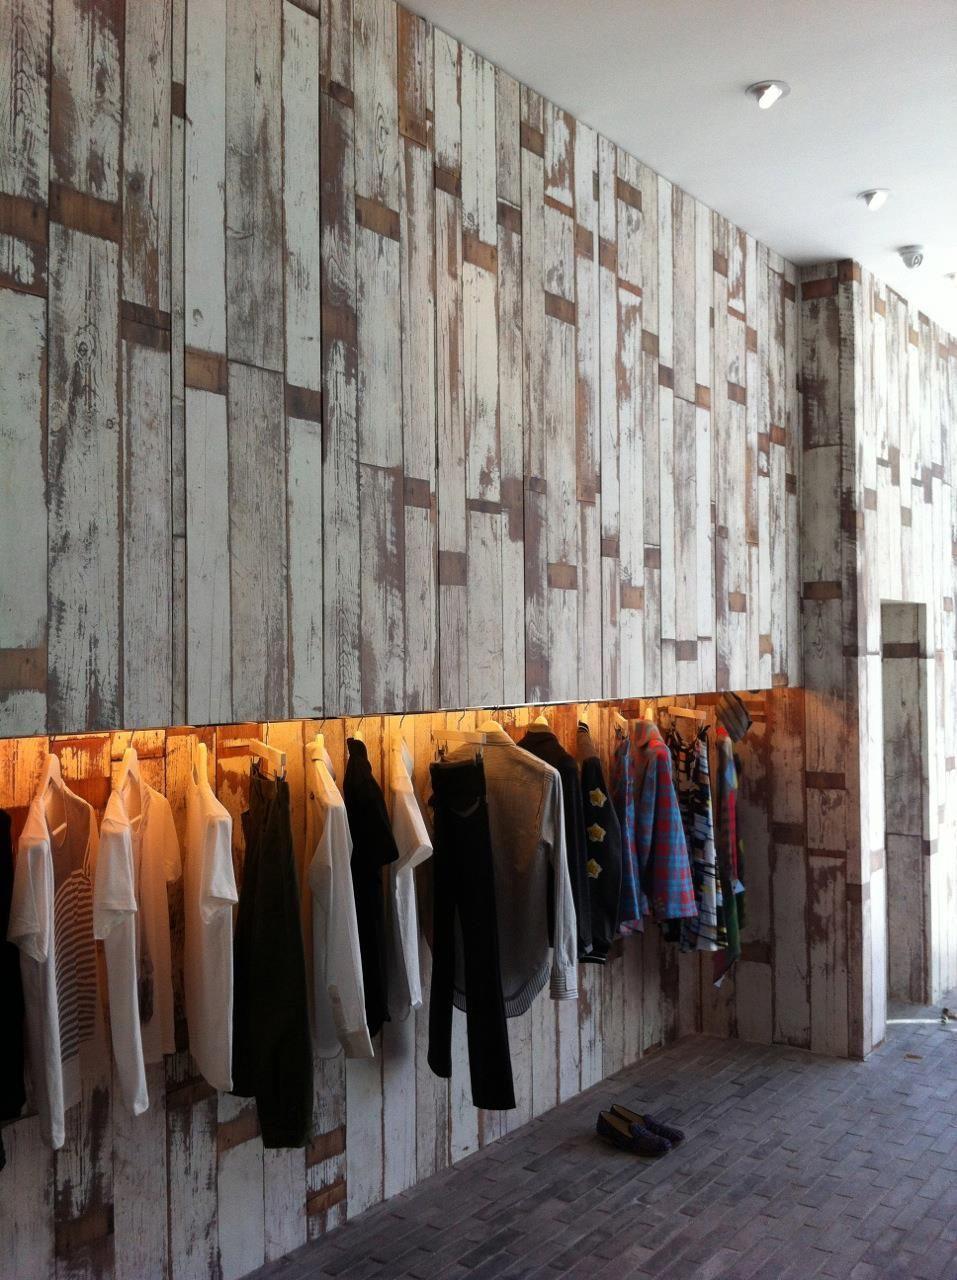 Piet hein eek scrapwood wallpaper modern wallpaper los angeles - Scrapwood Wallpaper Phe 02 By Piet Hein Eek Recently Displayed In A Fashion Store